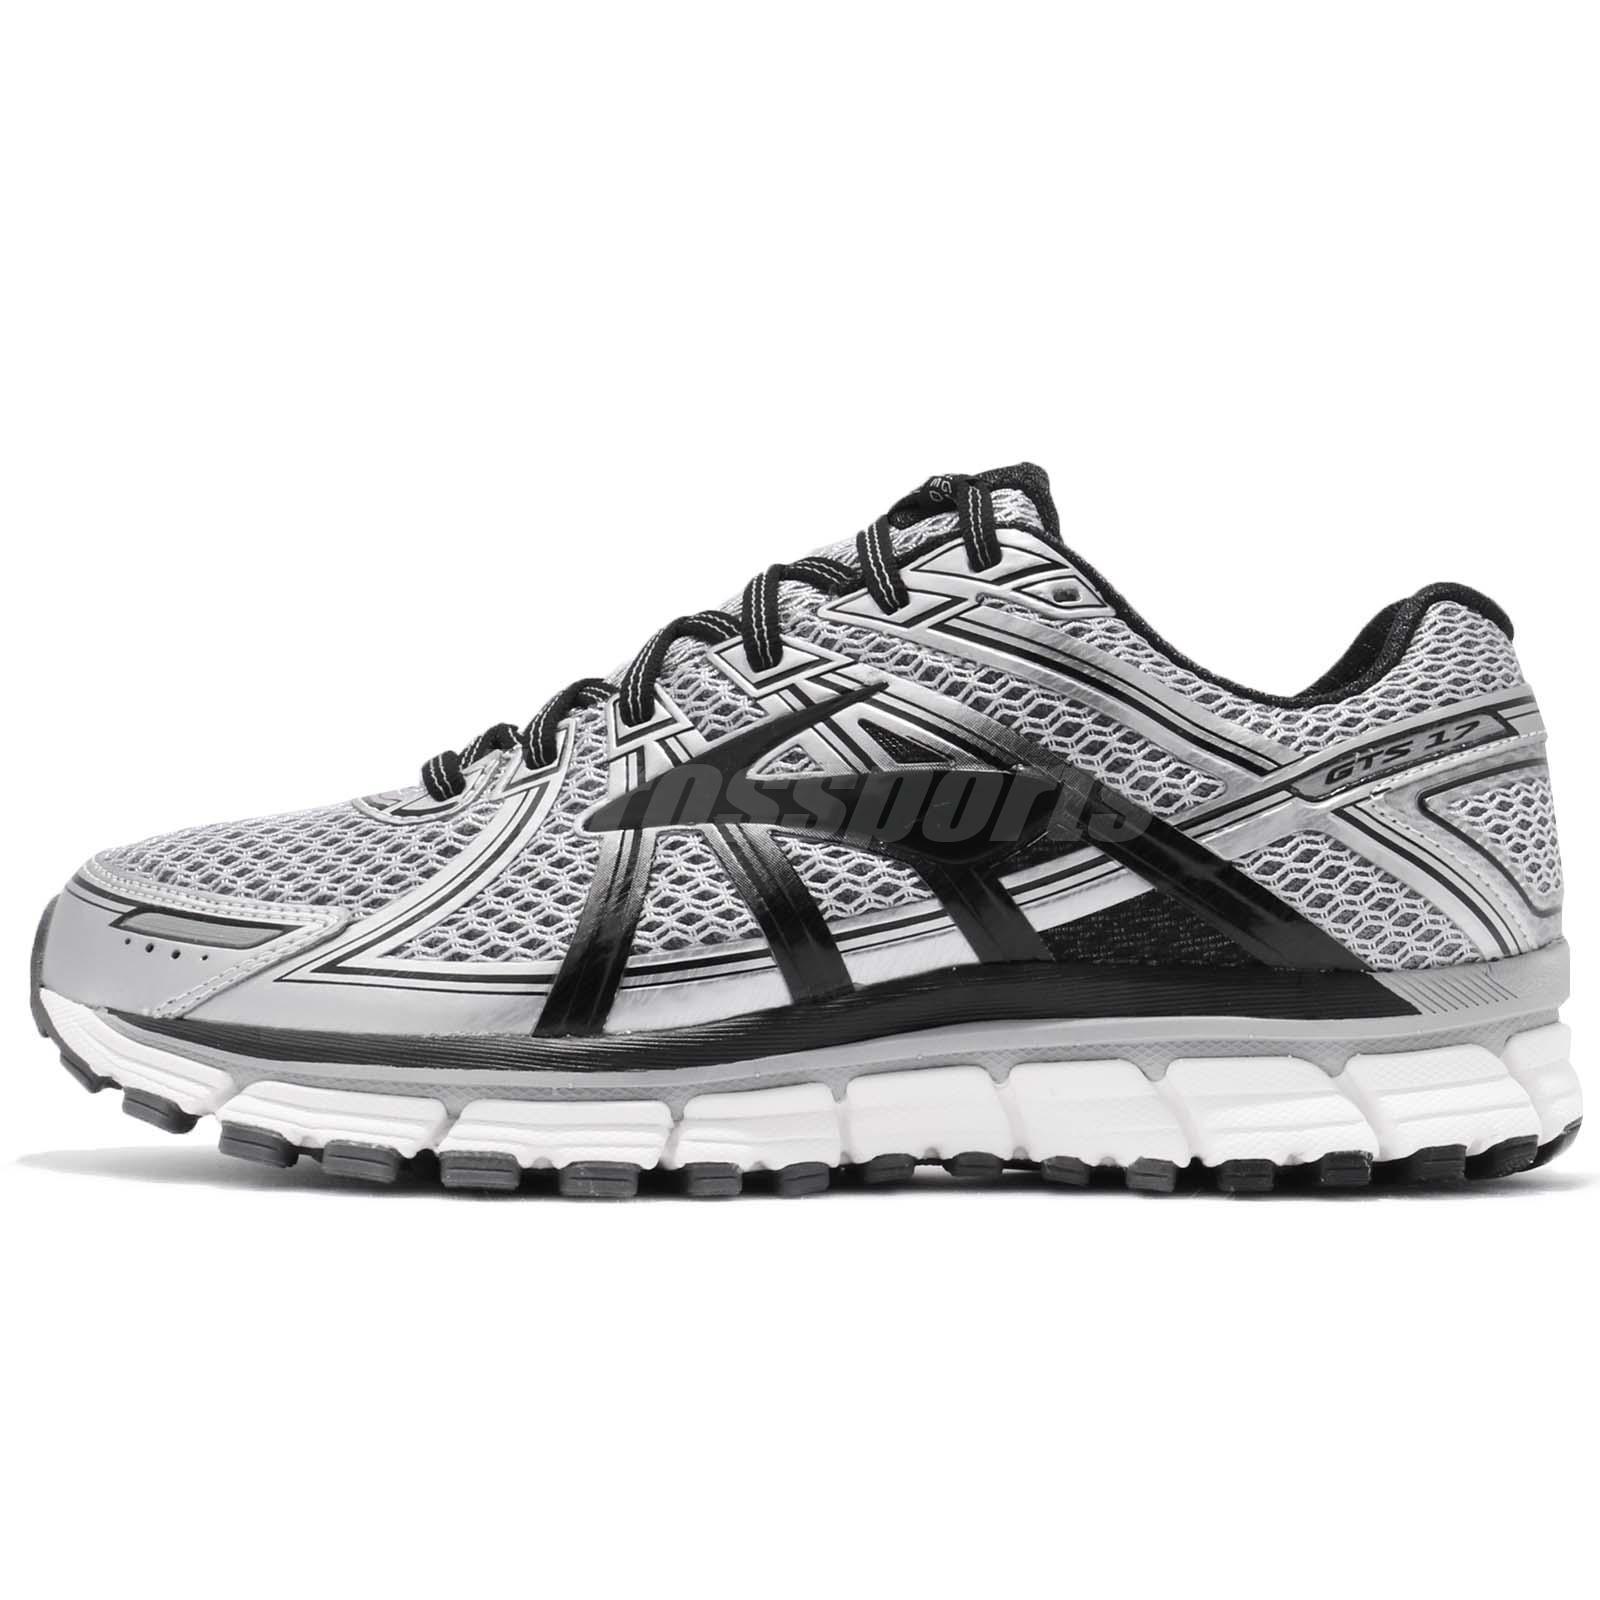 a4d0802e231 Brooks Adrenaline GTS 17 Silver Black Anthracite Men Running Shoes 1102411 D